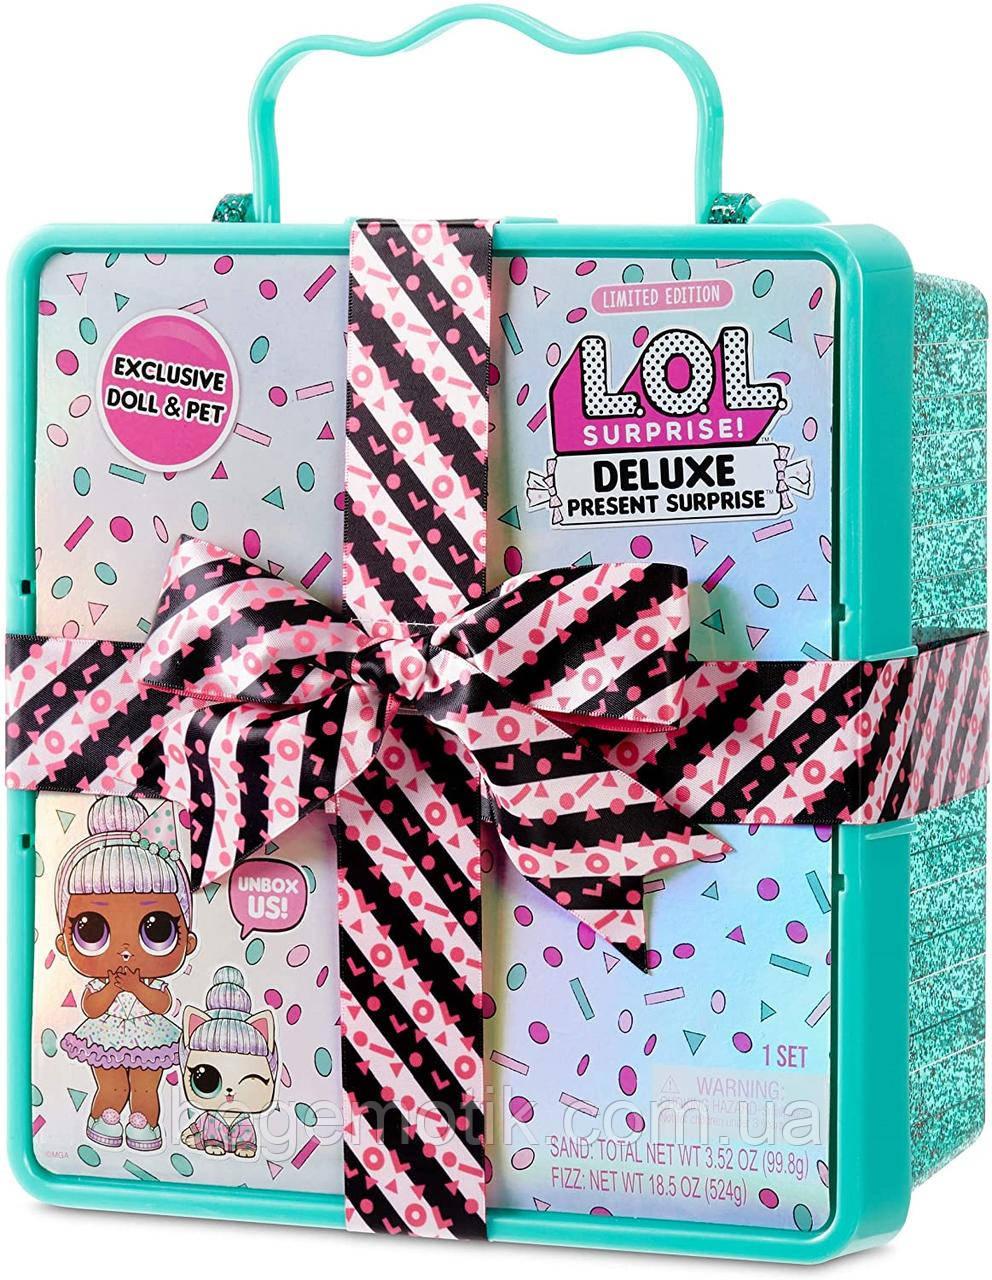 LOL Surprise Deluxe Подарочный набор Спринклс кукла и питомец Present Surprise with Sprinkles Doll and Pet